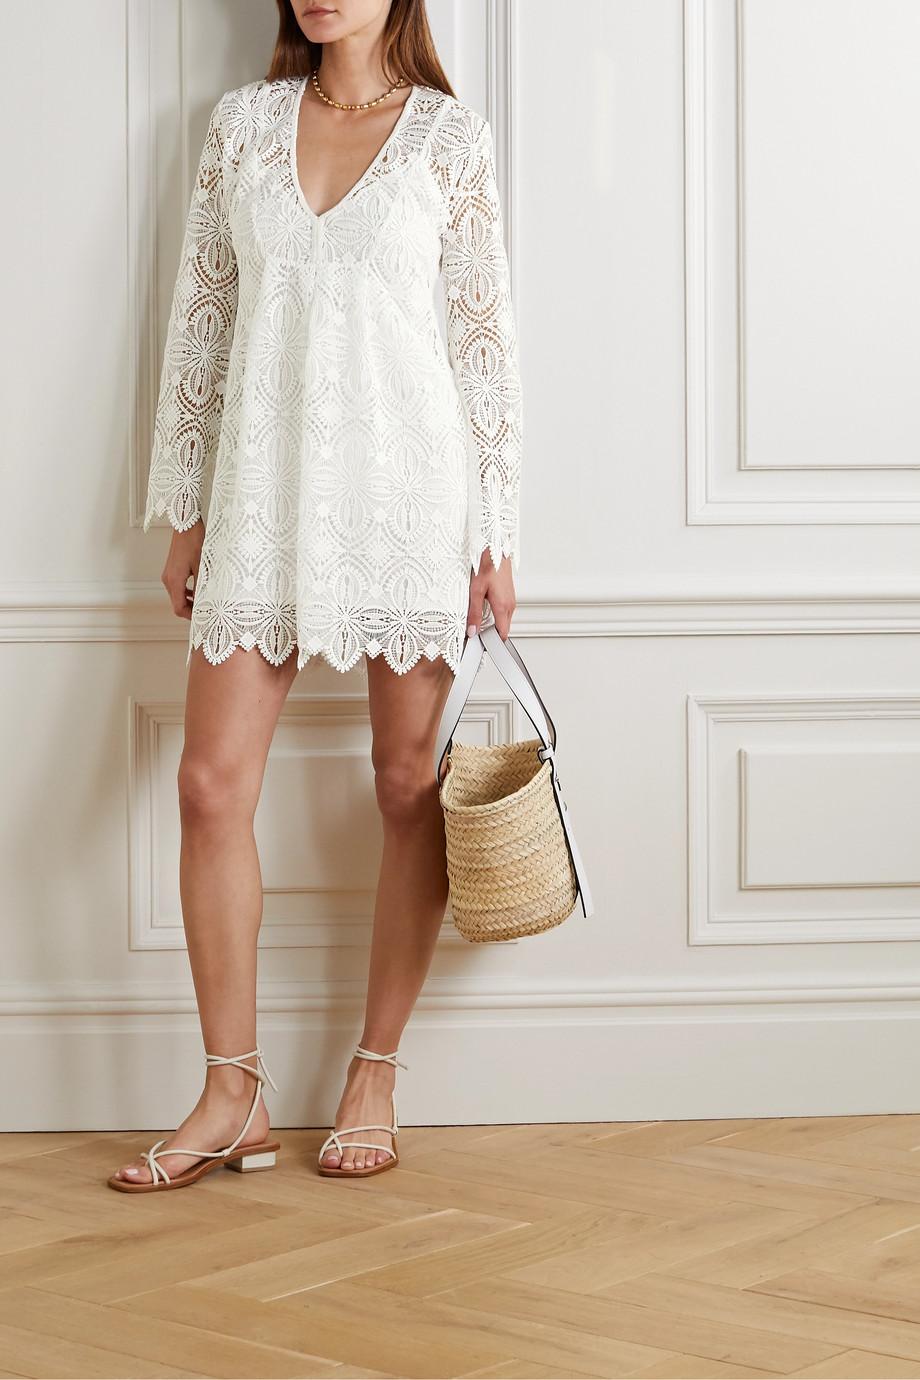 Melissa Odabash Elizabeth scalloped guipure lace mini dress